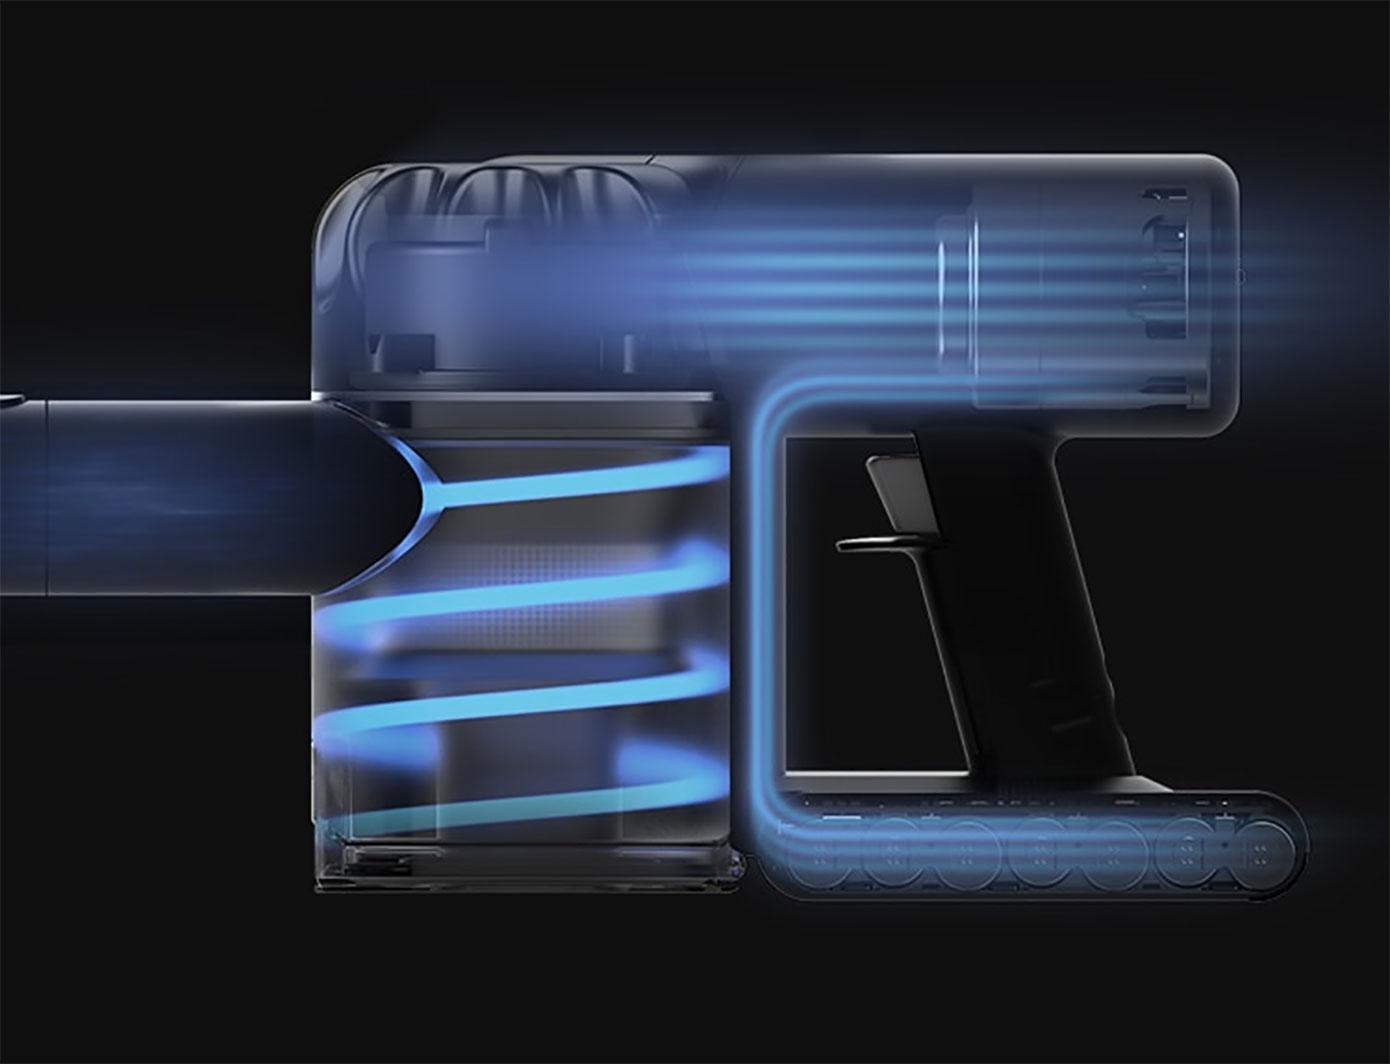 Opisanie Besprovodnoj Ruchnoj Pylesos Xiaomi Dreame V9p Wireless Vacuum Cleaner 03